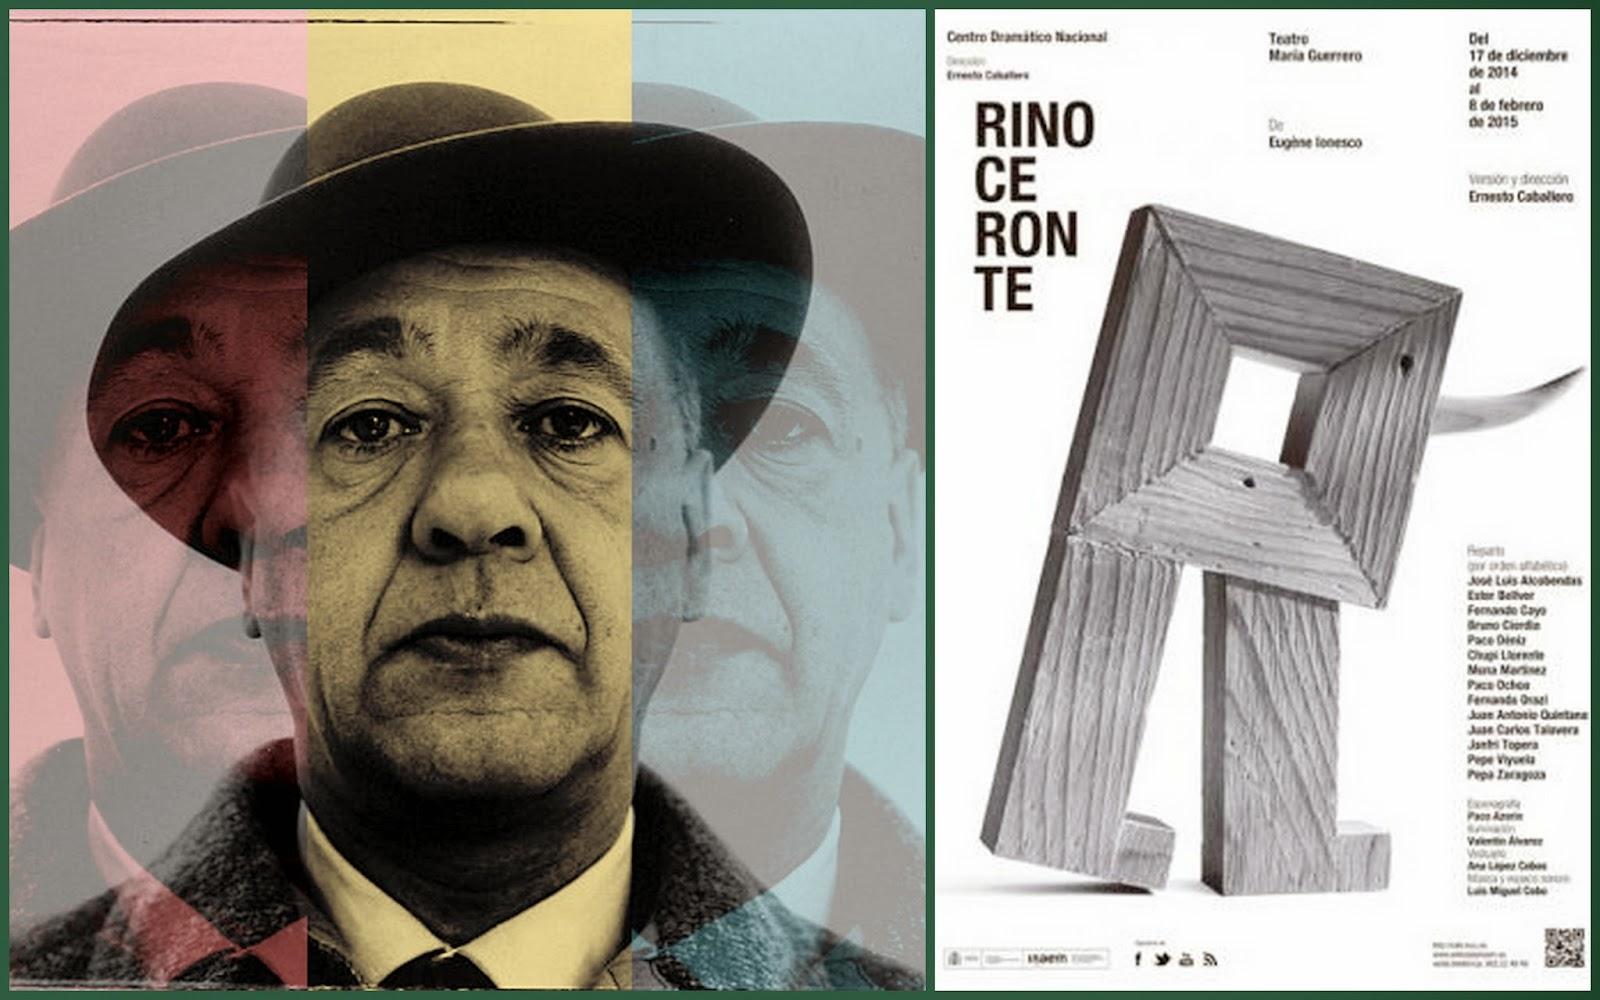 Ernesto Caballero, Rinocéros, Ionesco, Pepe Viyuela